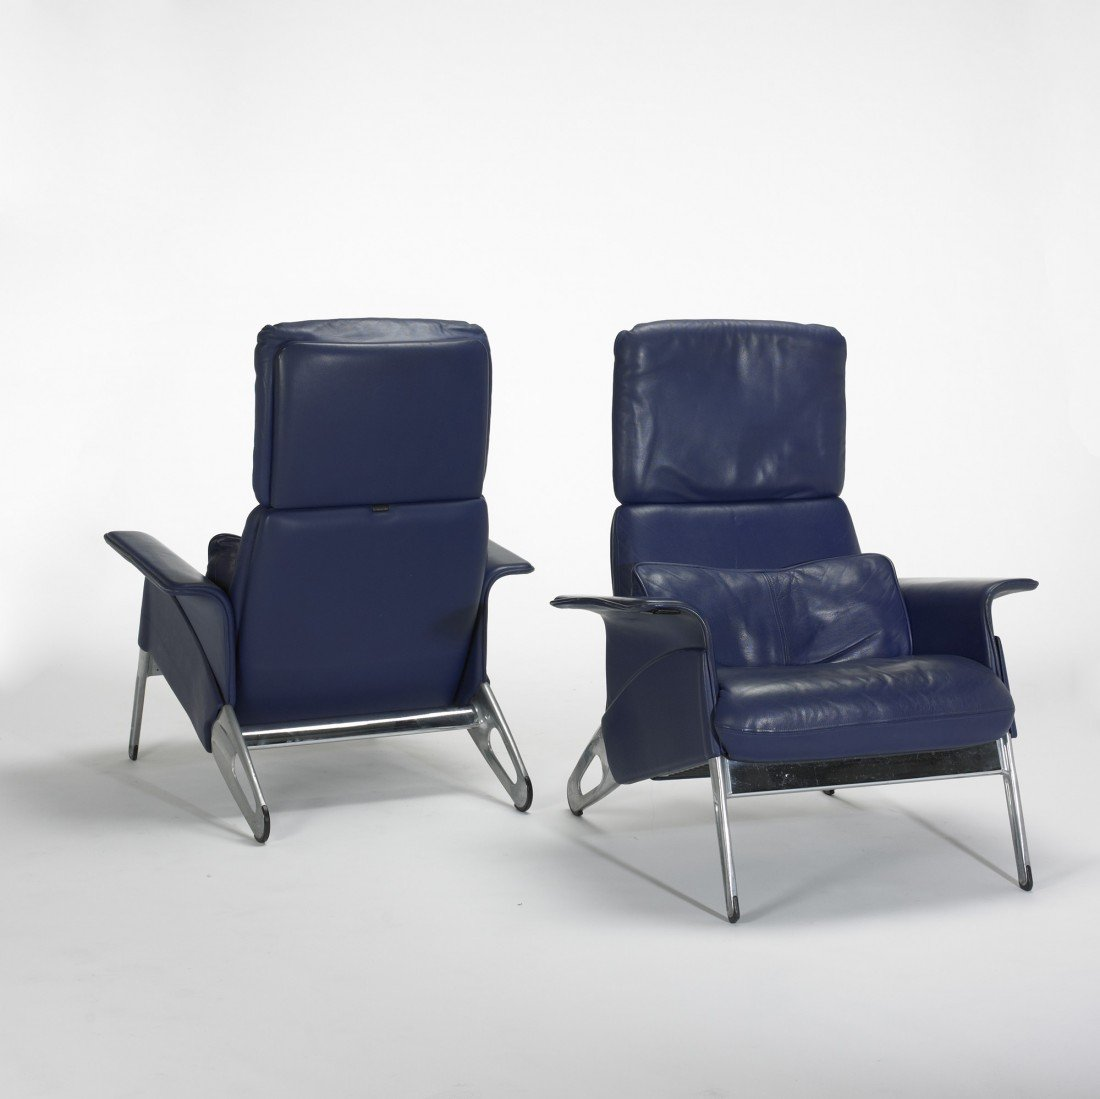 272: Geoff Hollington Hollington armchairs, pair